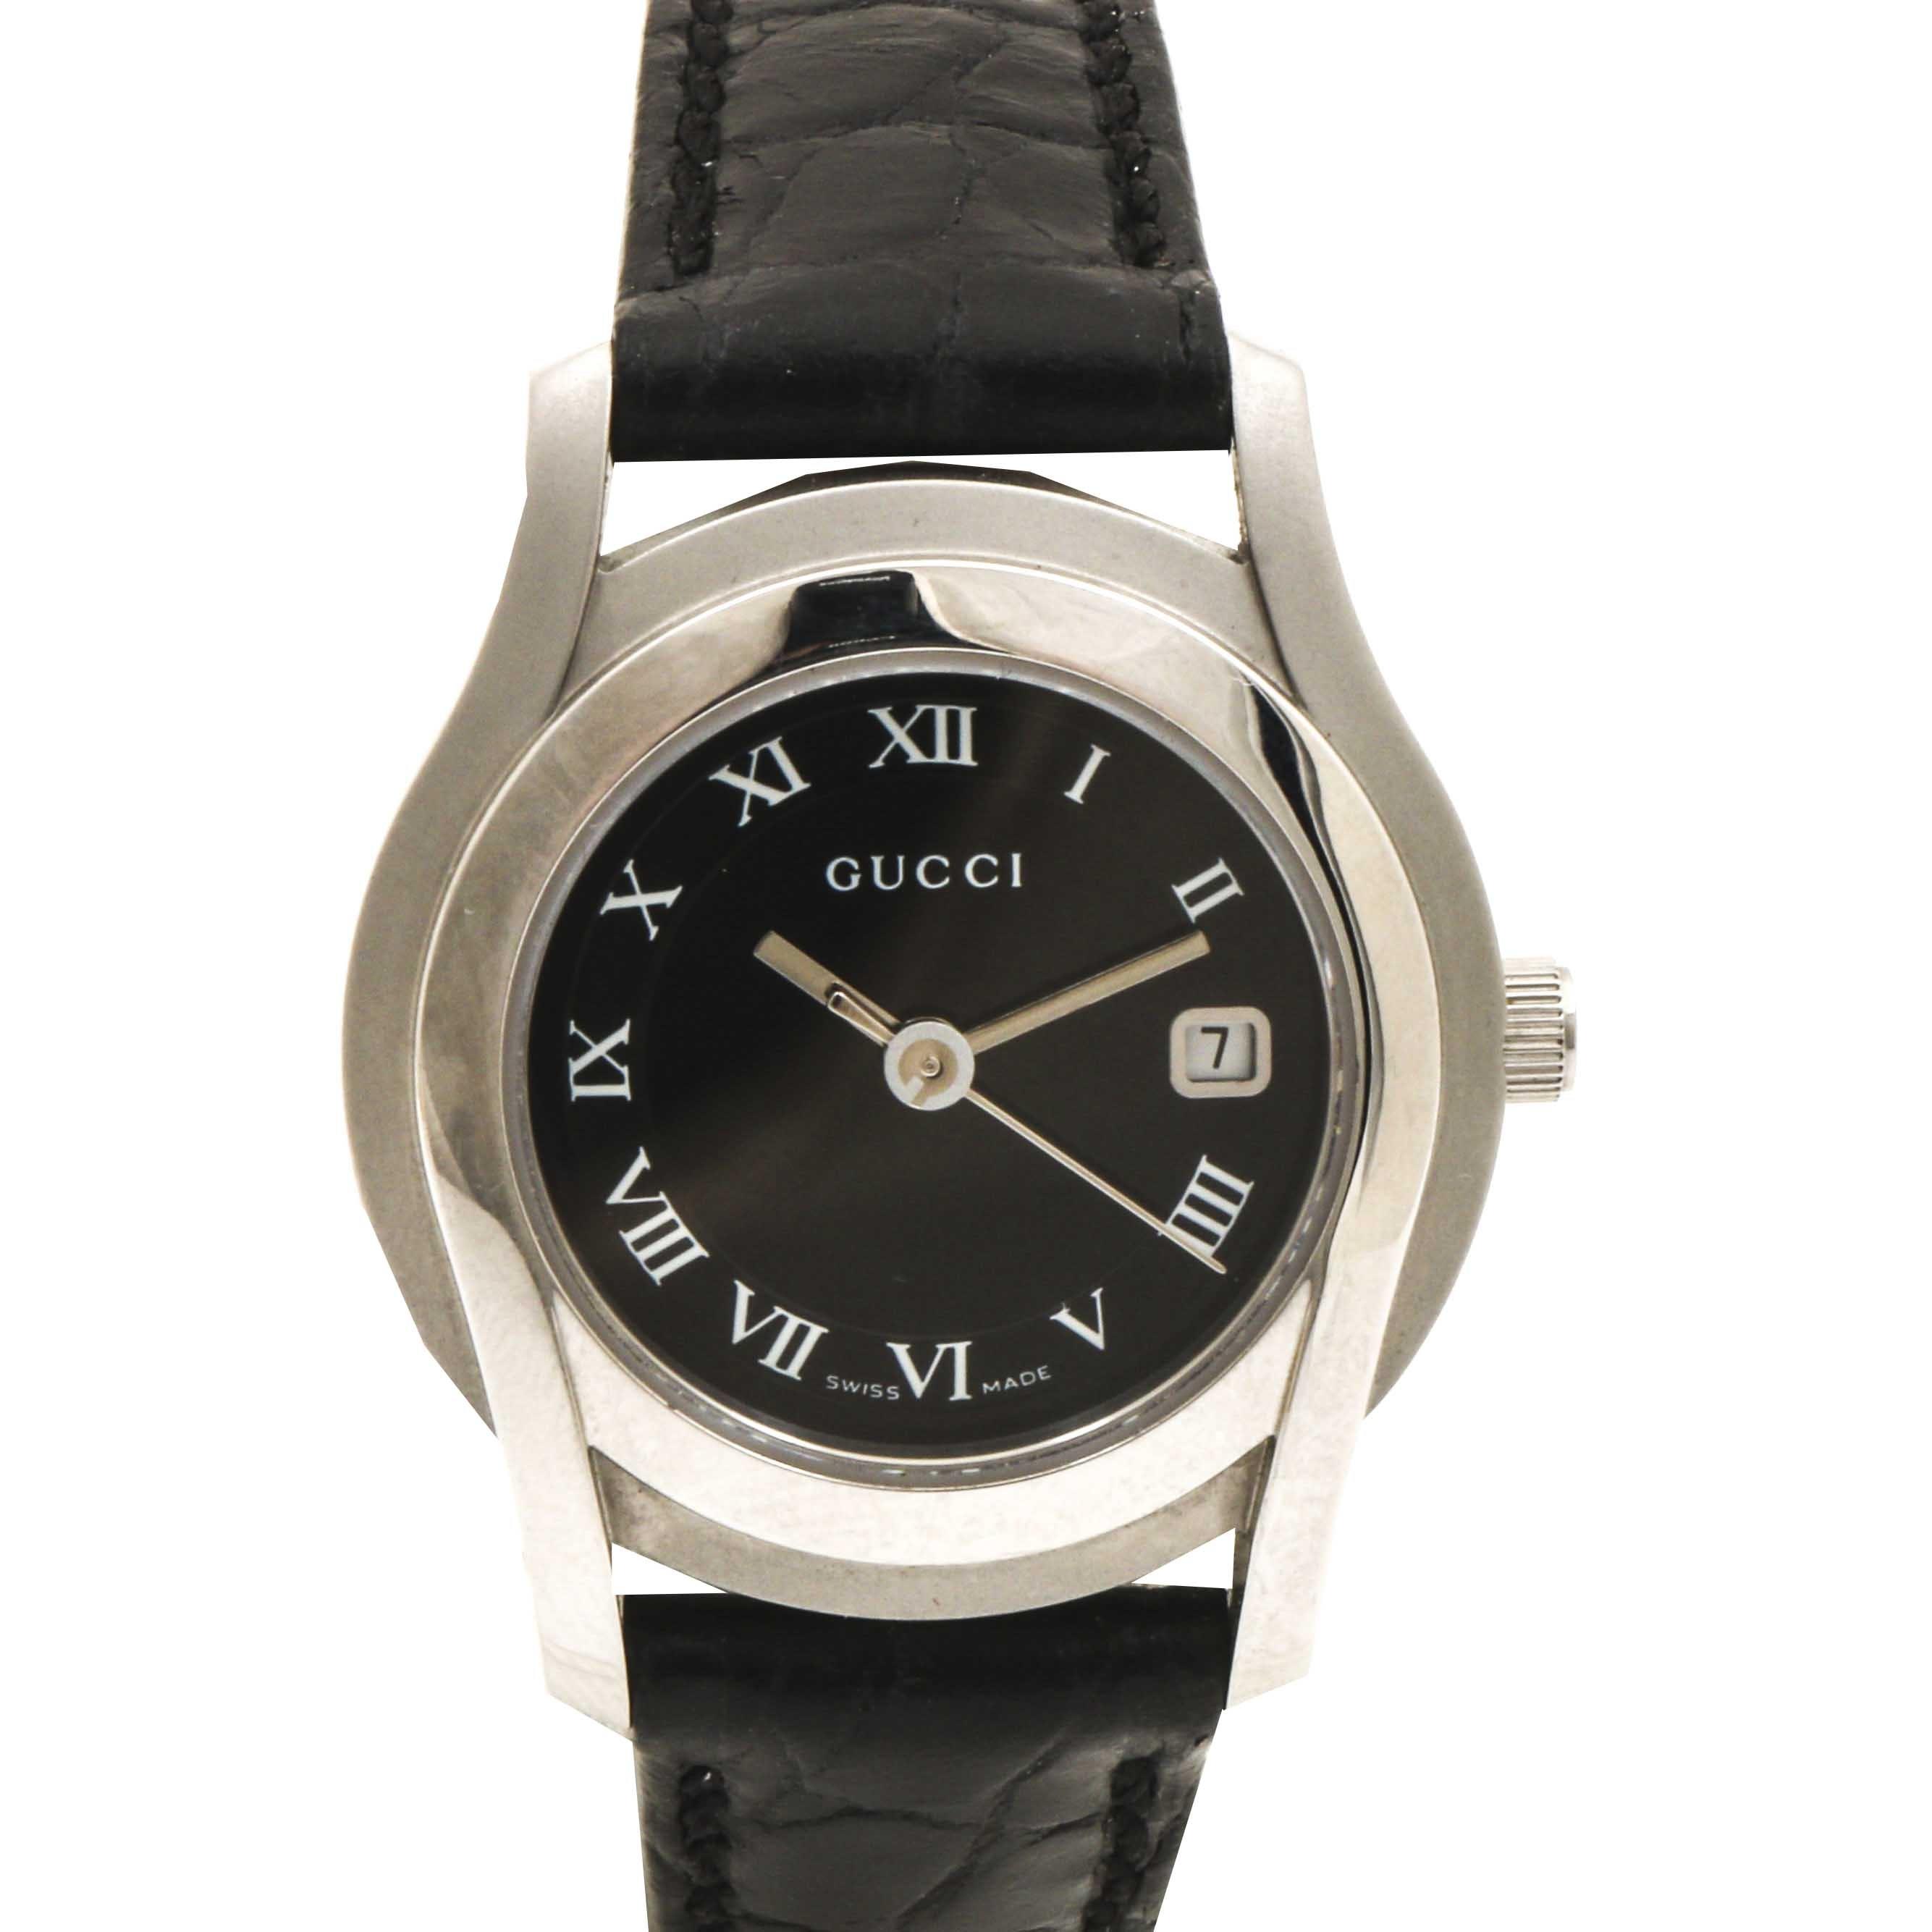 Gucci Swiss Made Wristwatch